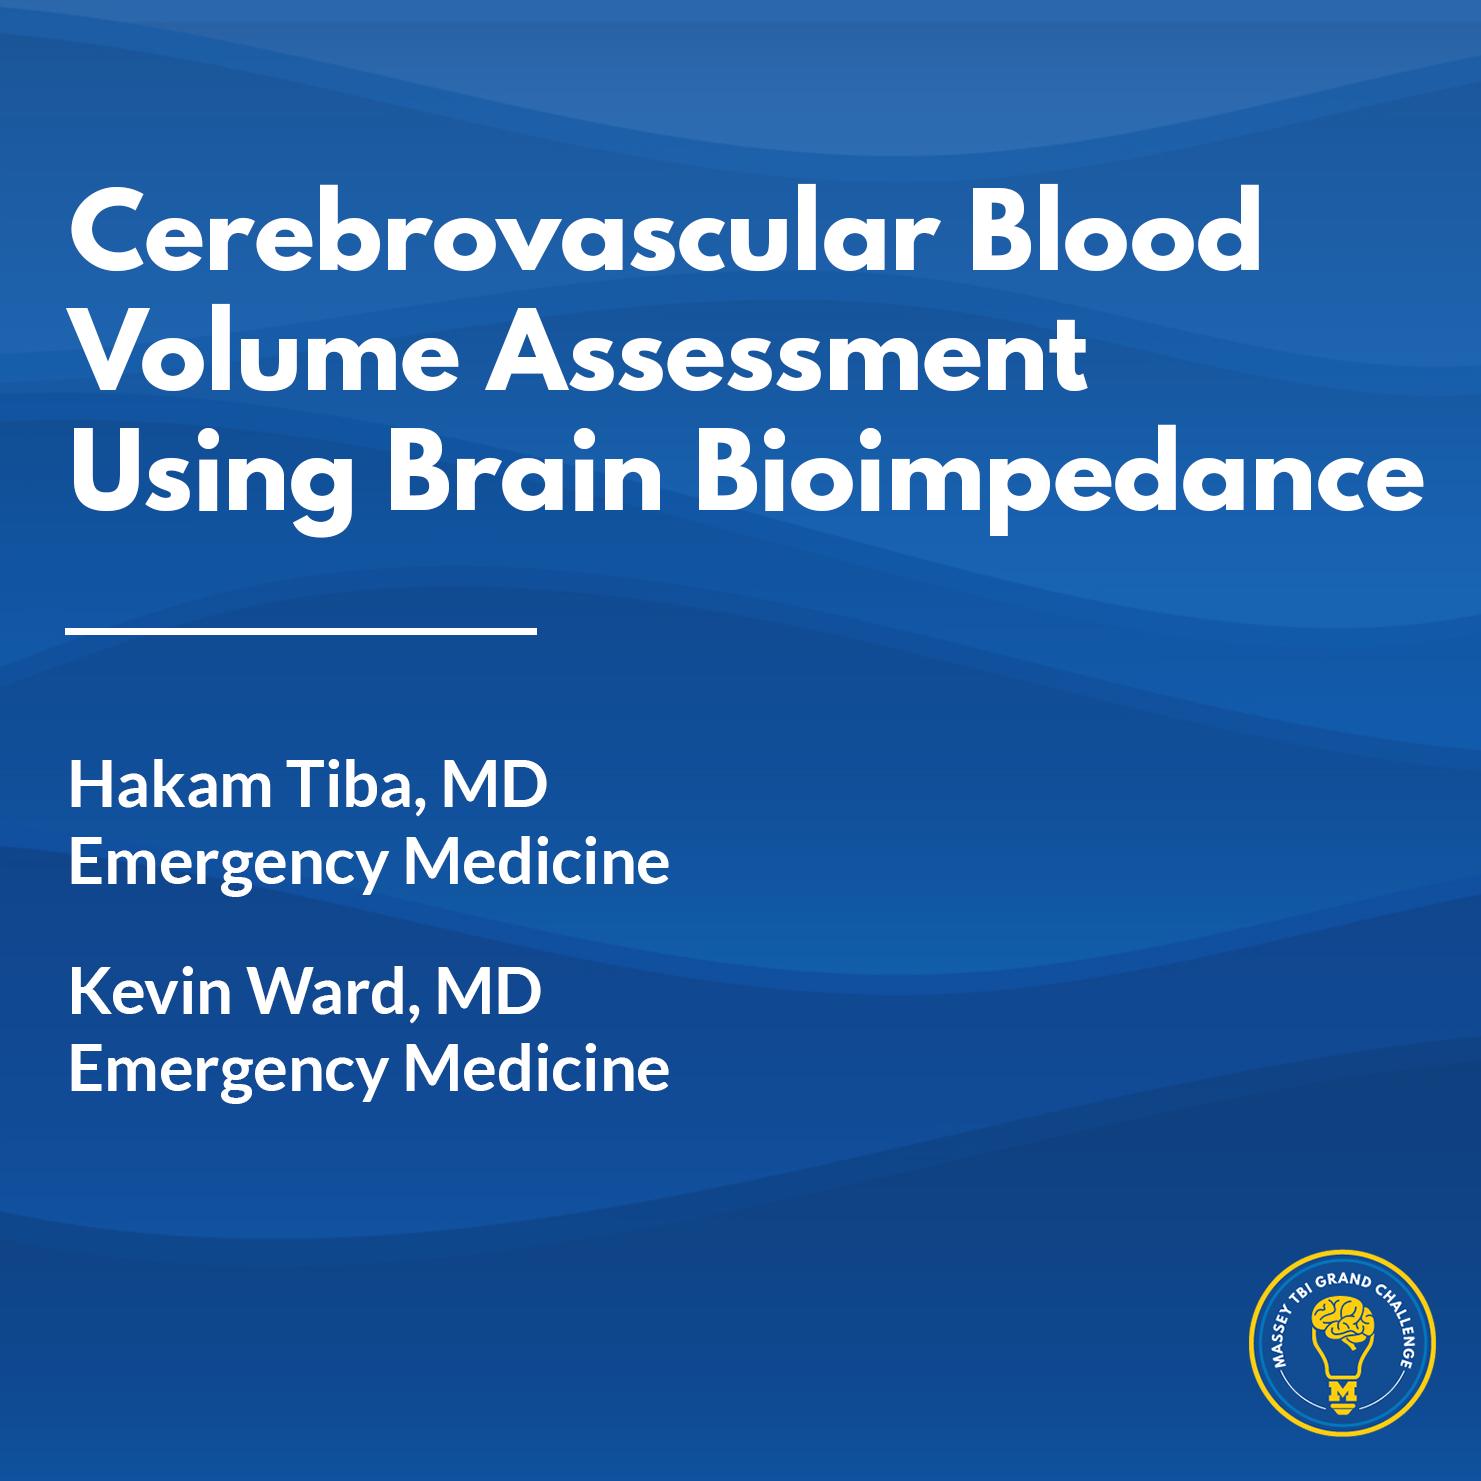 Cerebrovascular Blood Volume Assessment Using Brain Bioimpedance.png